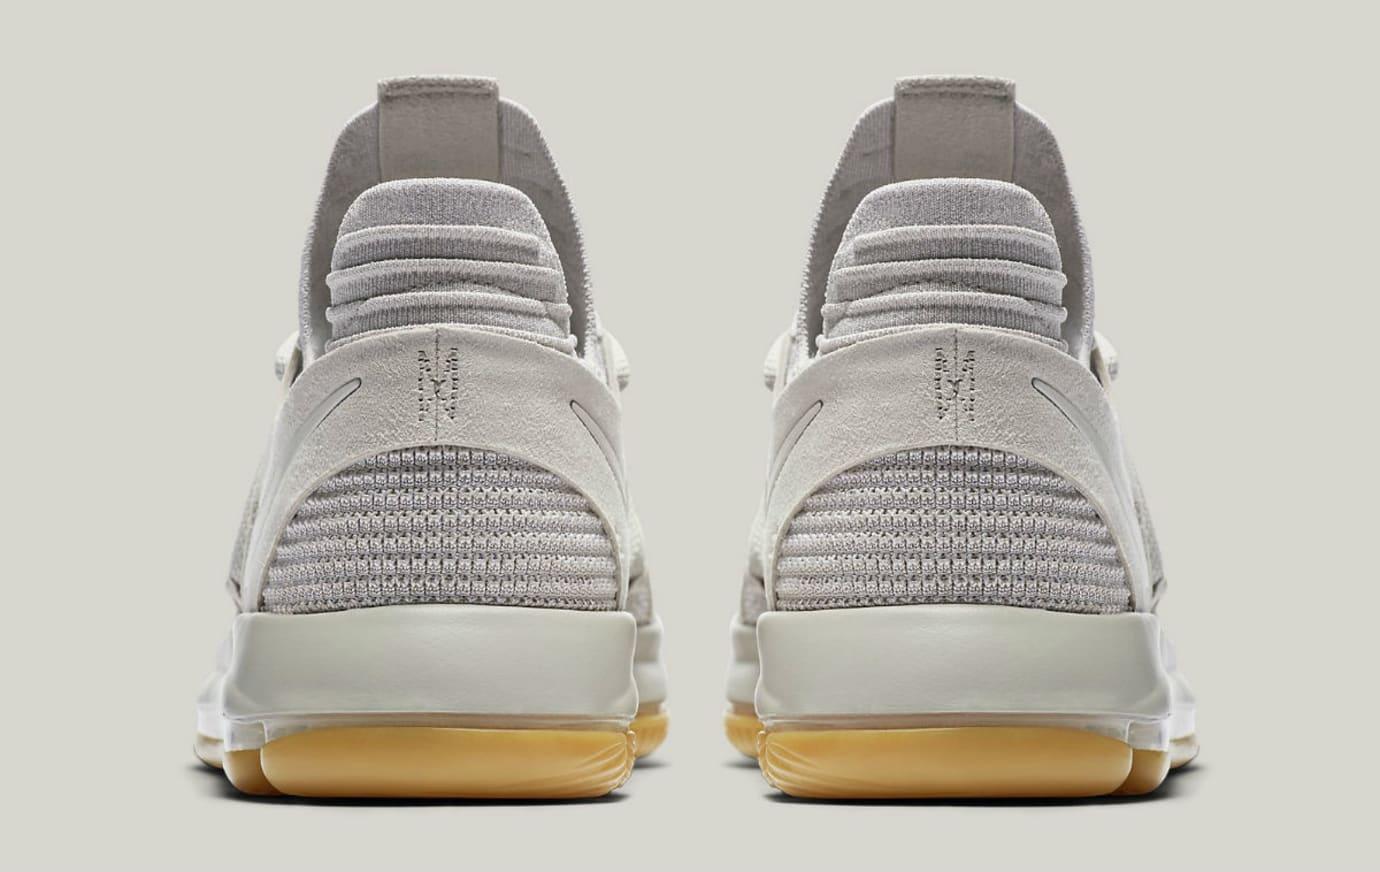 Nike KD 10 Pale Grey Light Bone Gum Release Date Heel 897817-001 b7de82e5e6